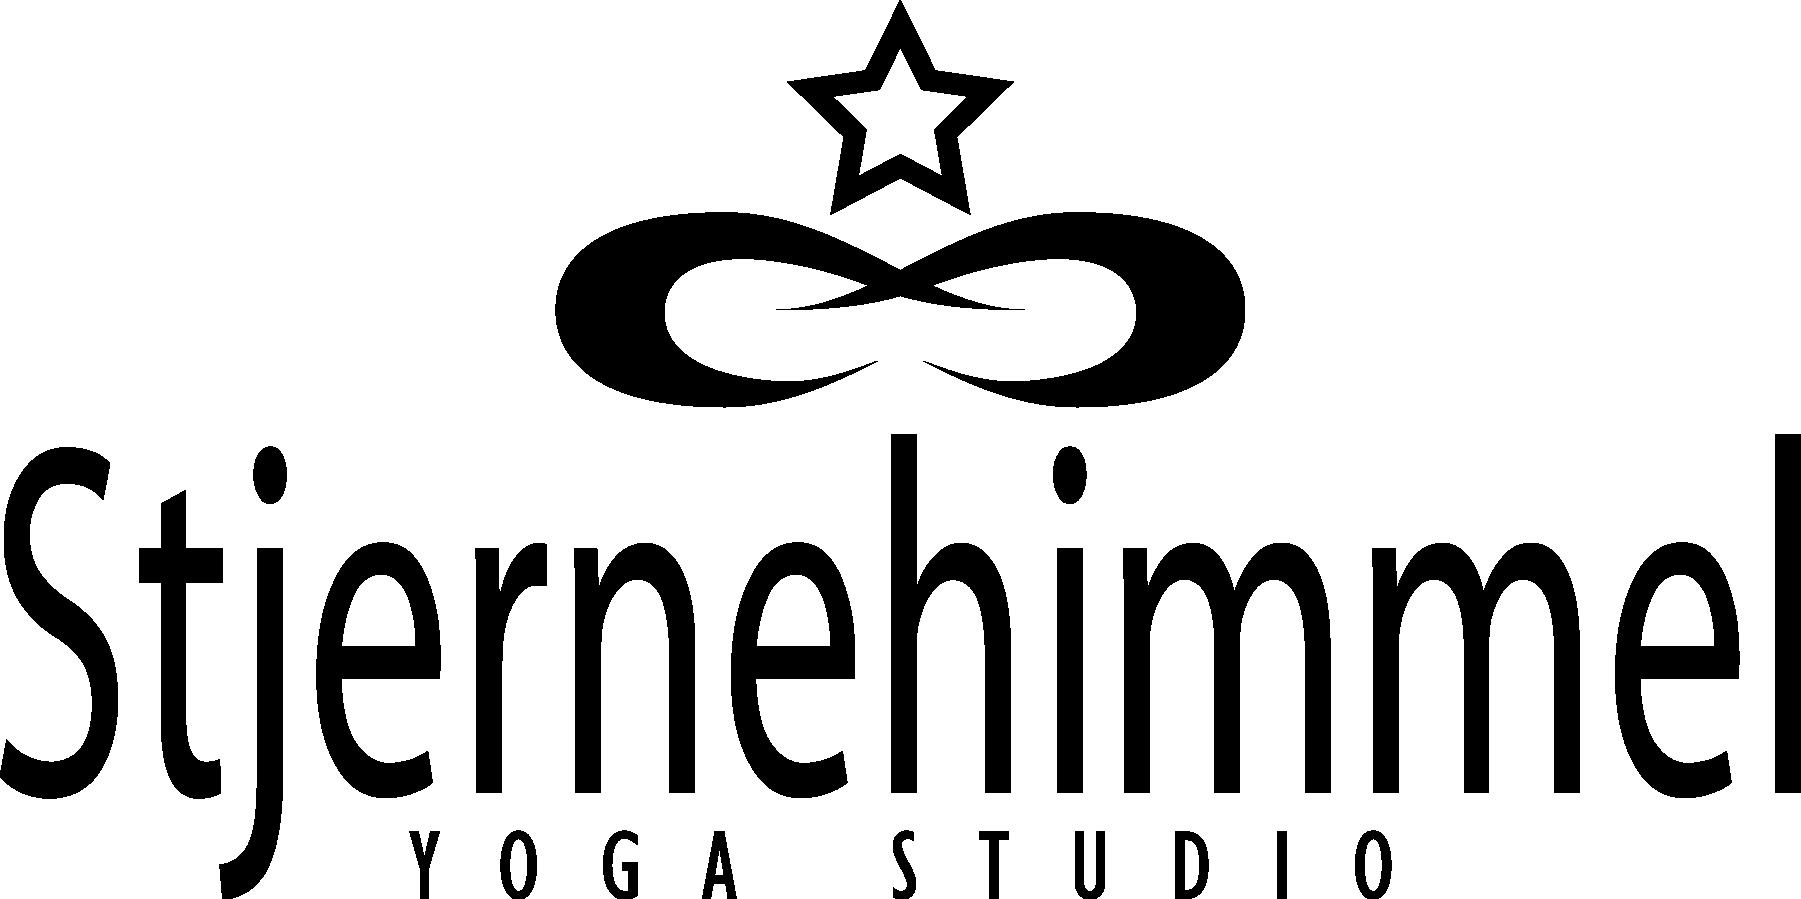 Stjernehimmel Yoga